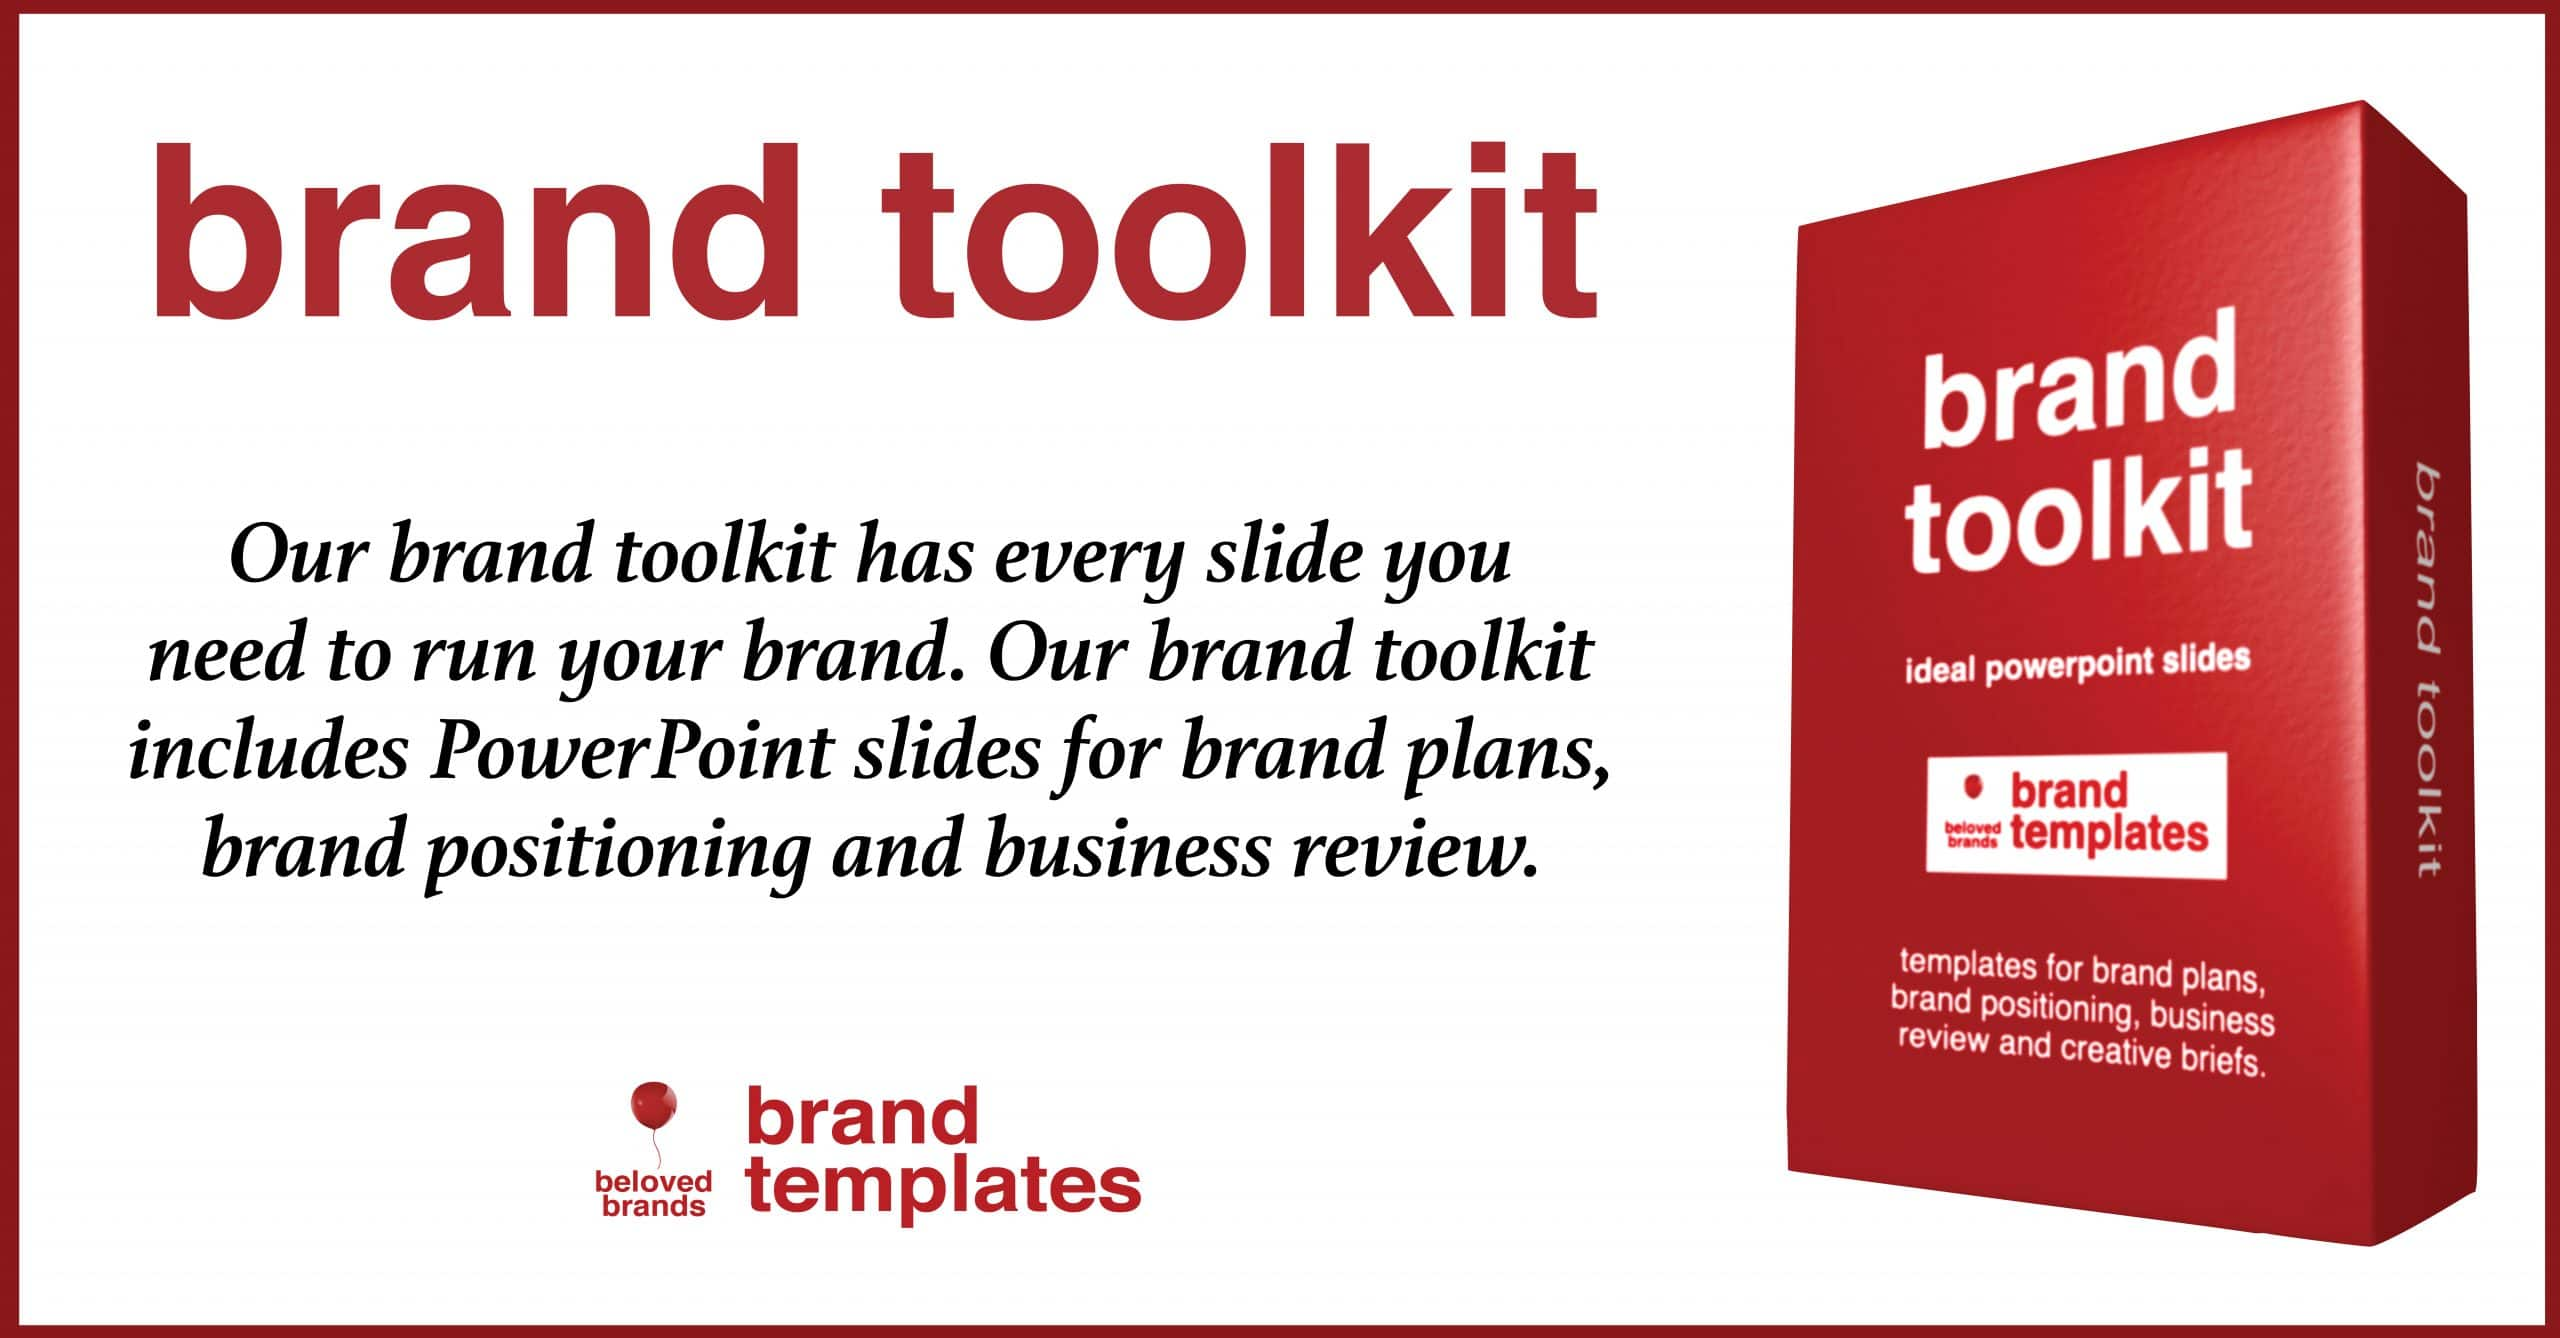 Brand Toolkit template